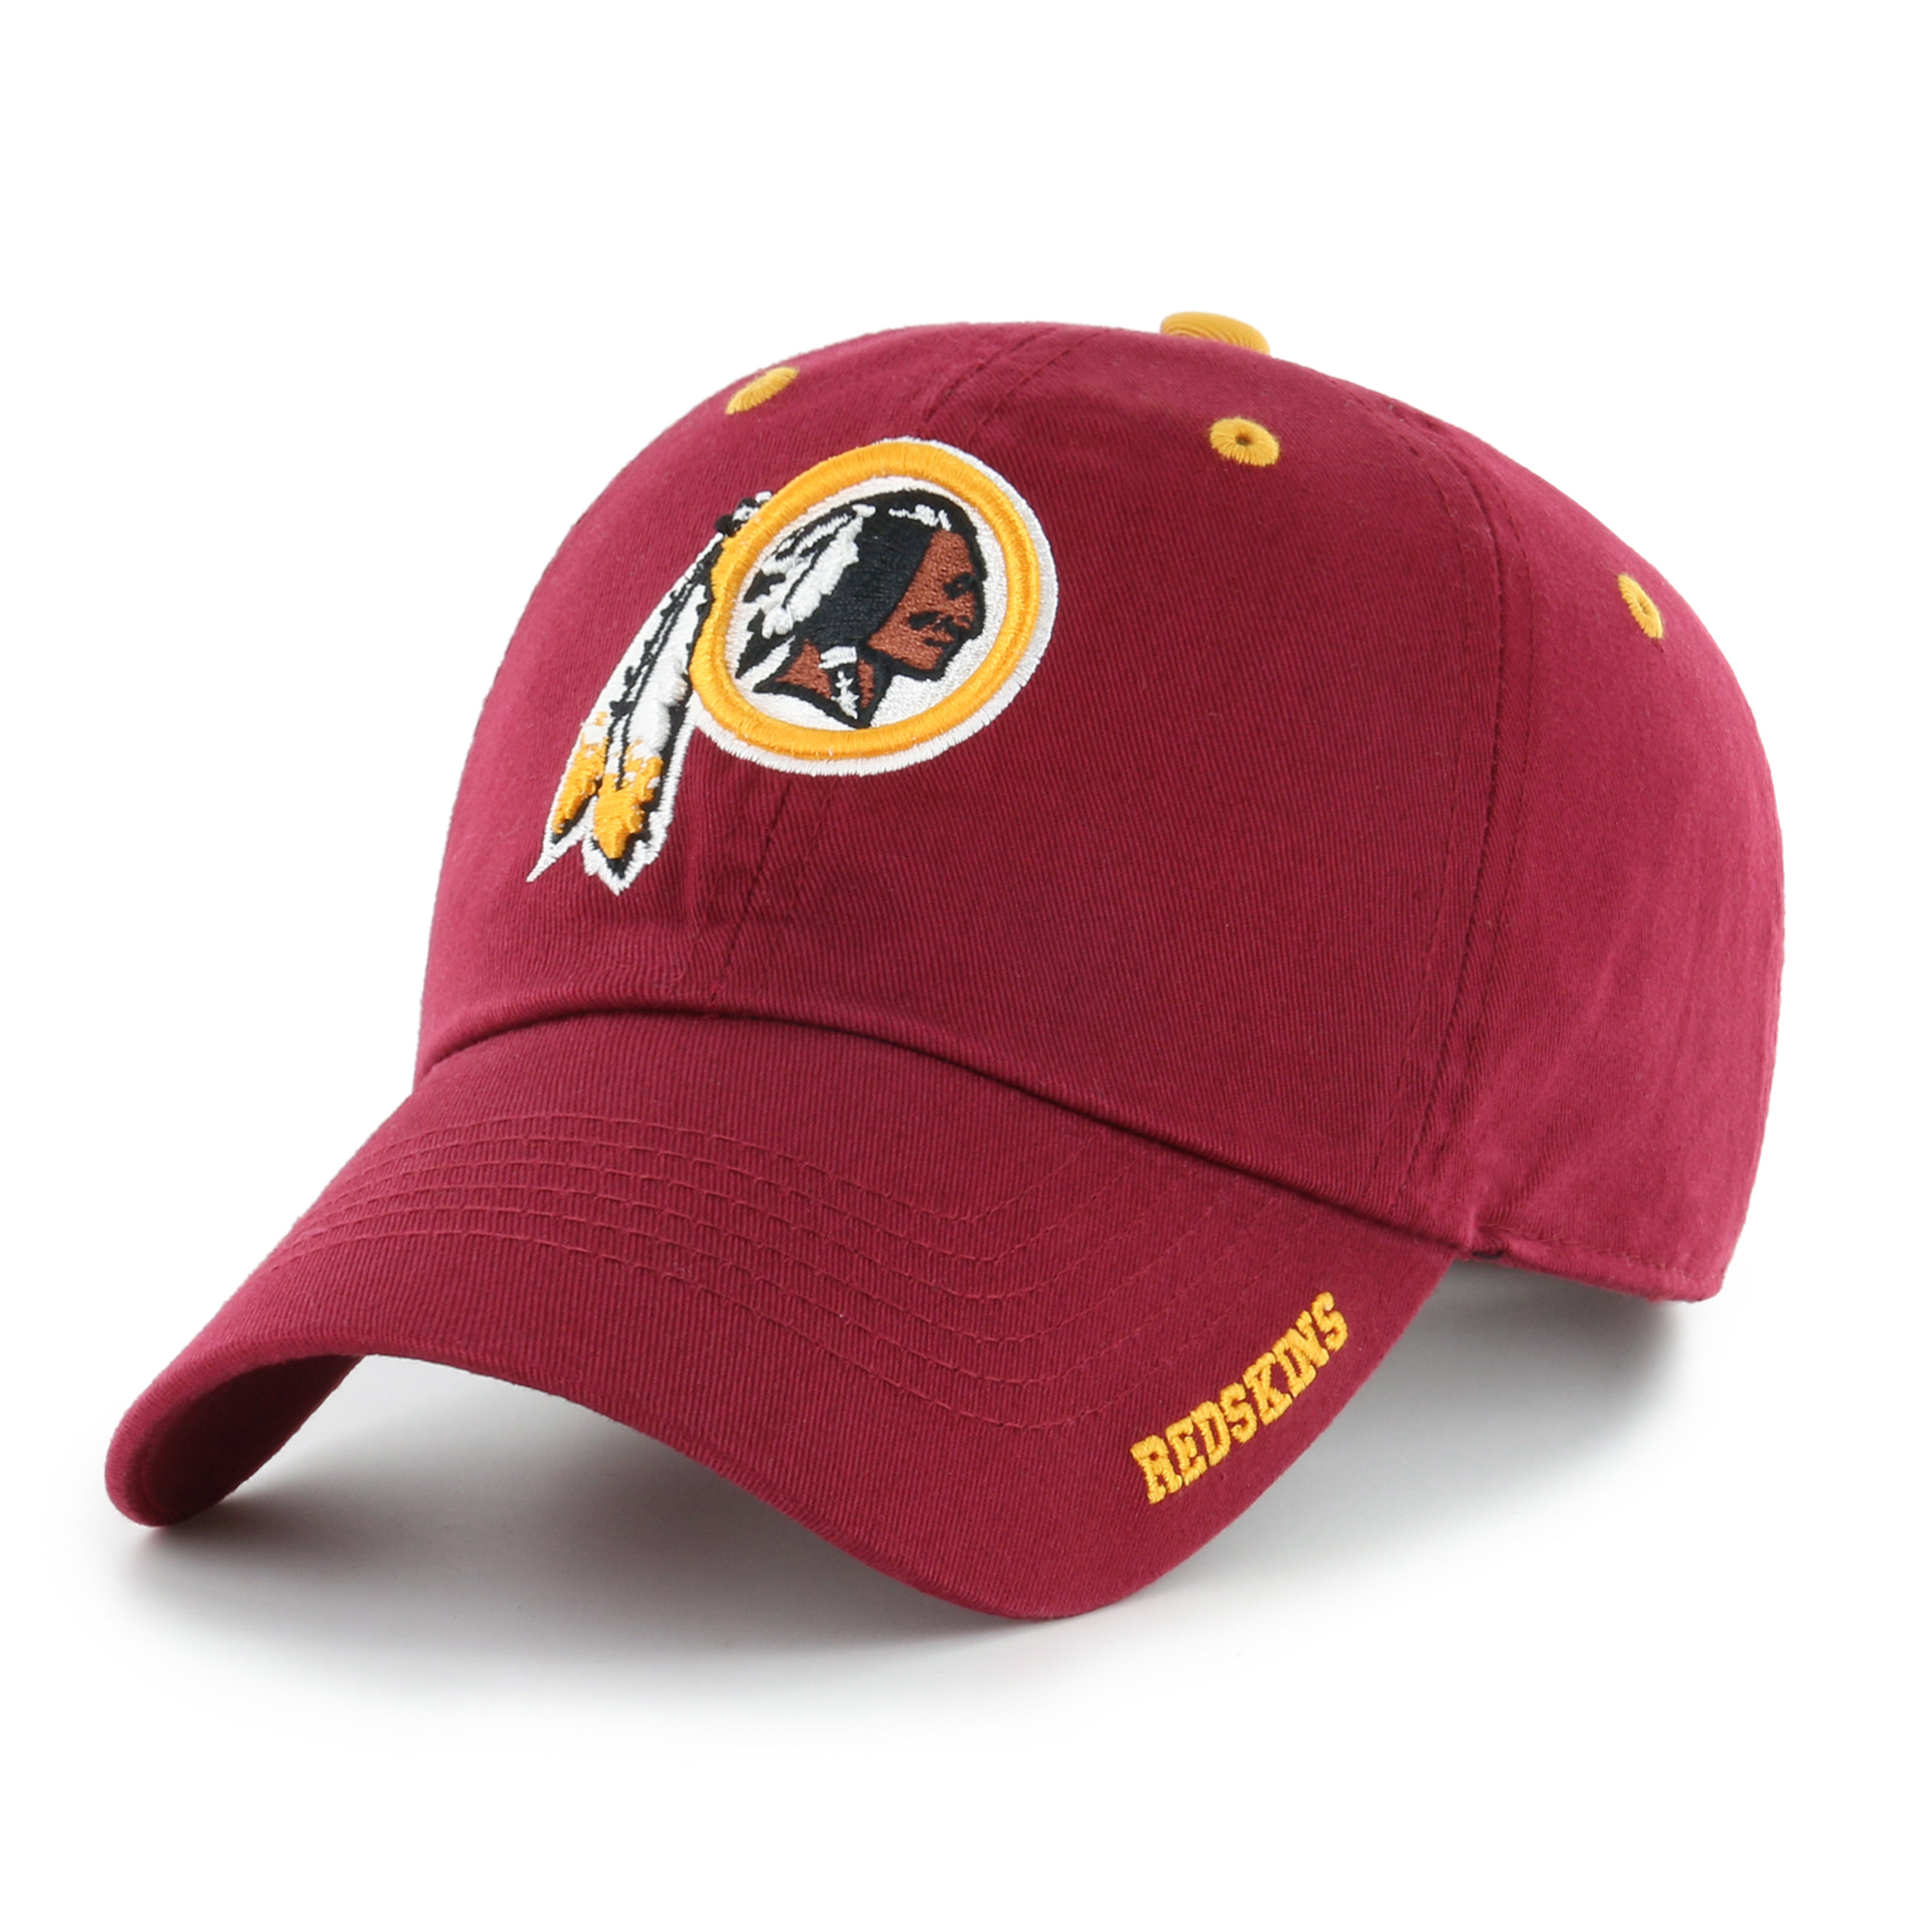 NFL Washington Redskins Ice Adjustable Cap/Hat by Fan Favorite